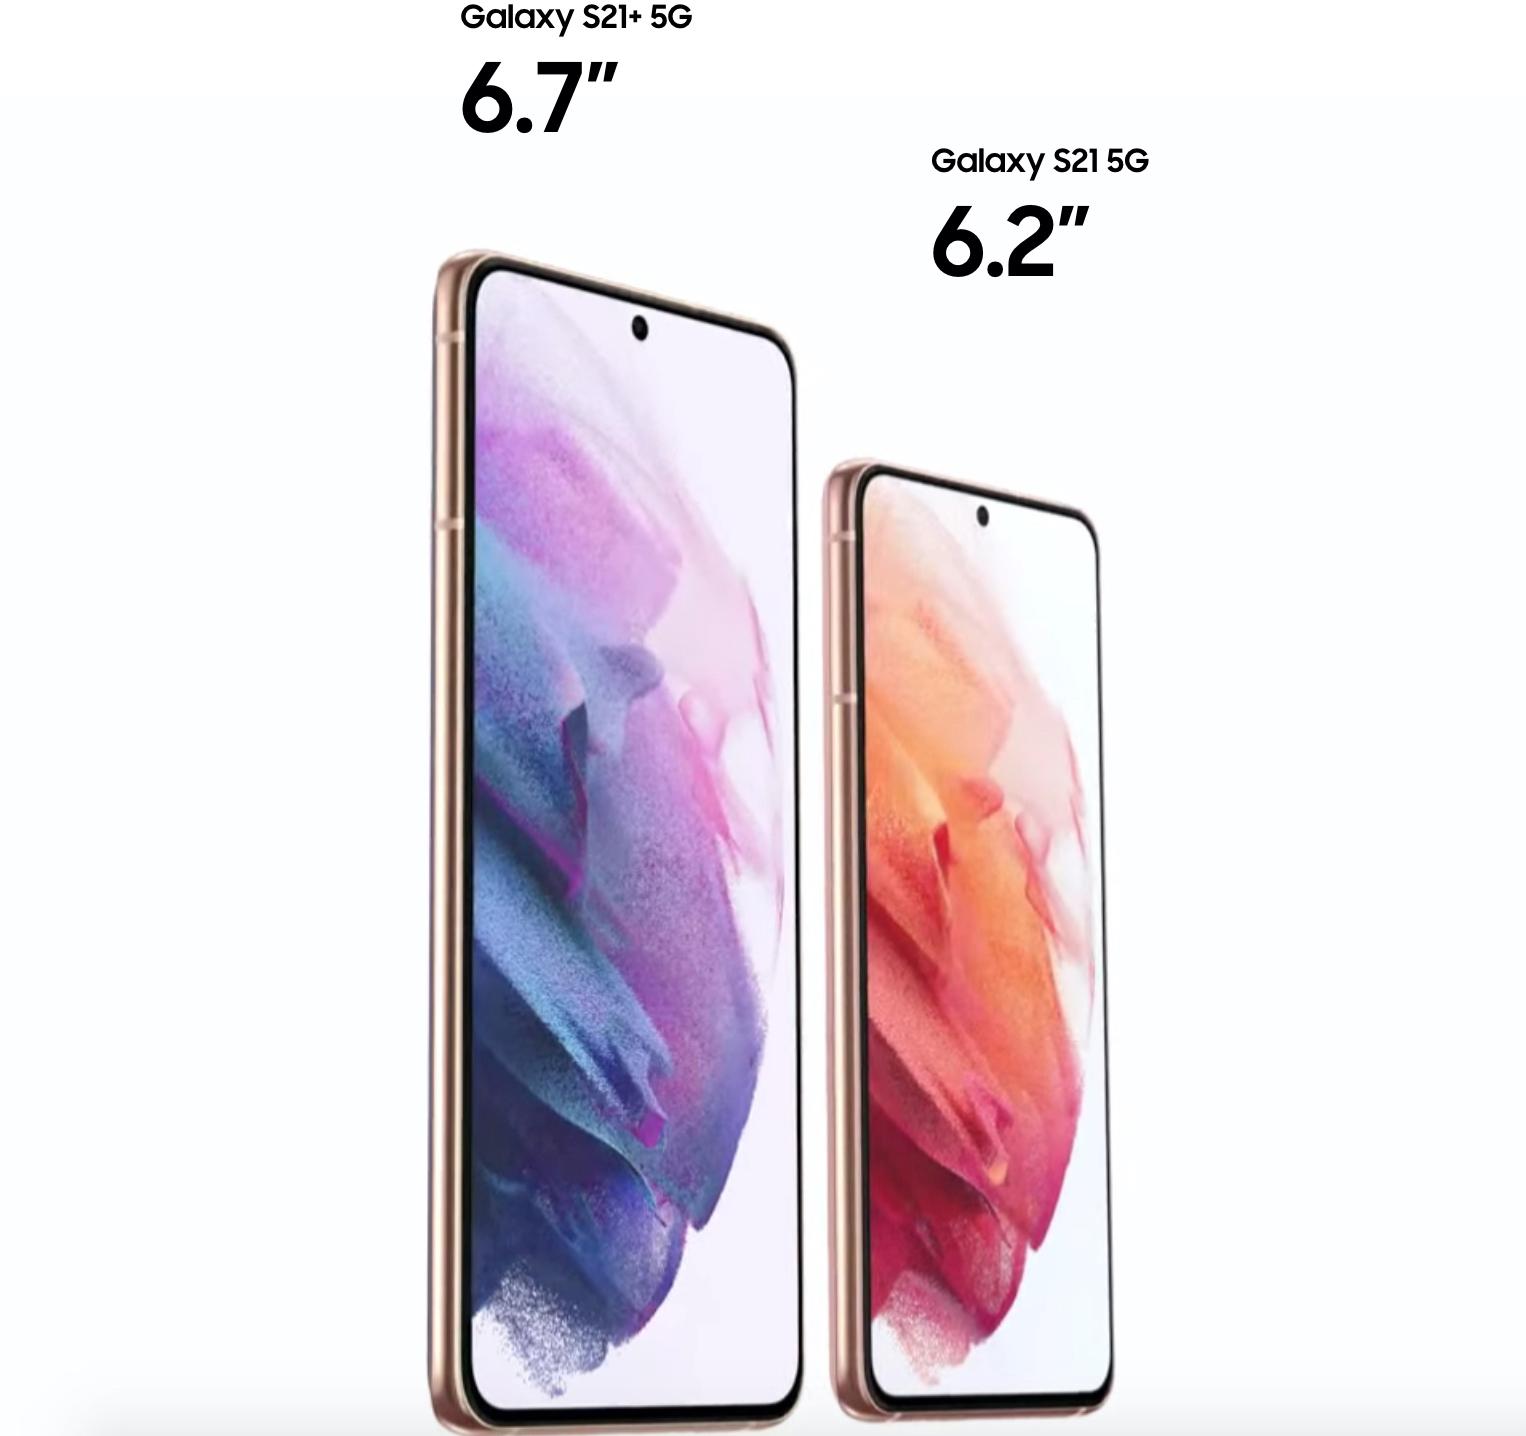 Samsung 21 Singapore